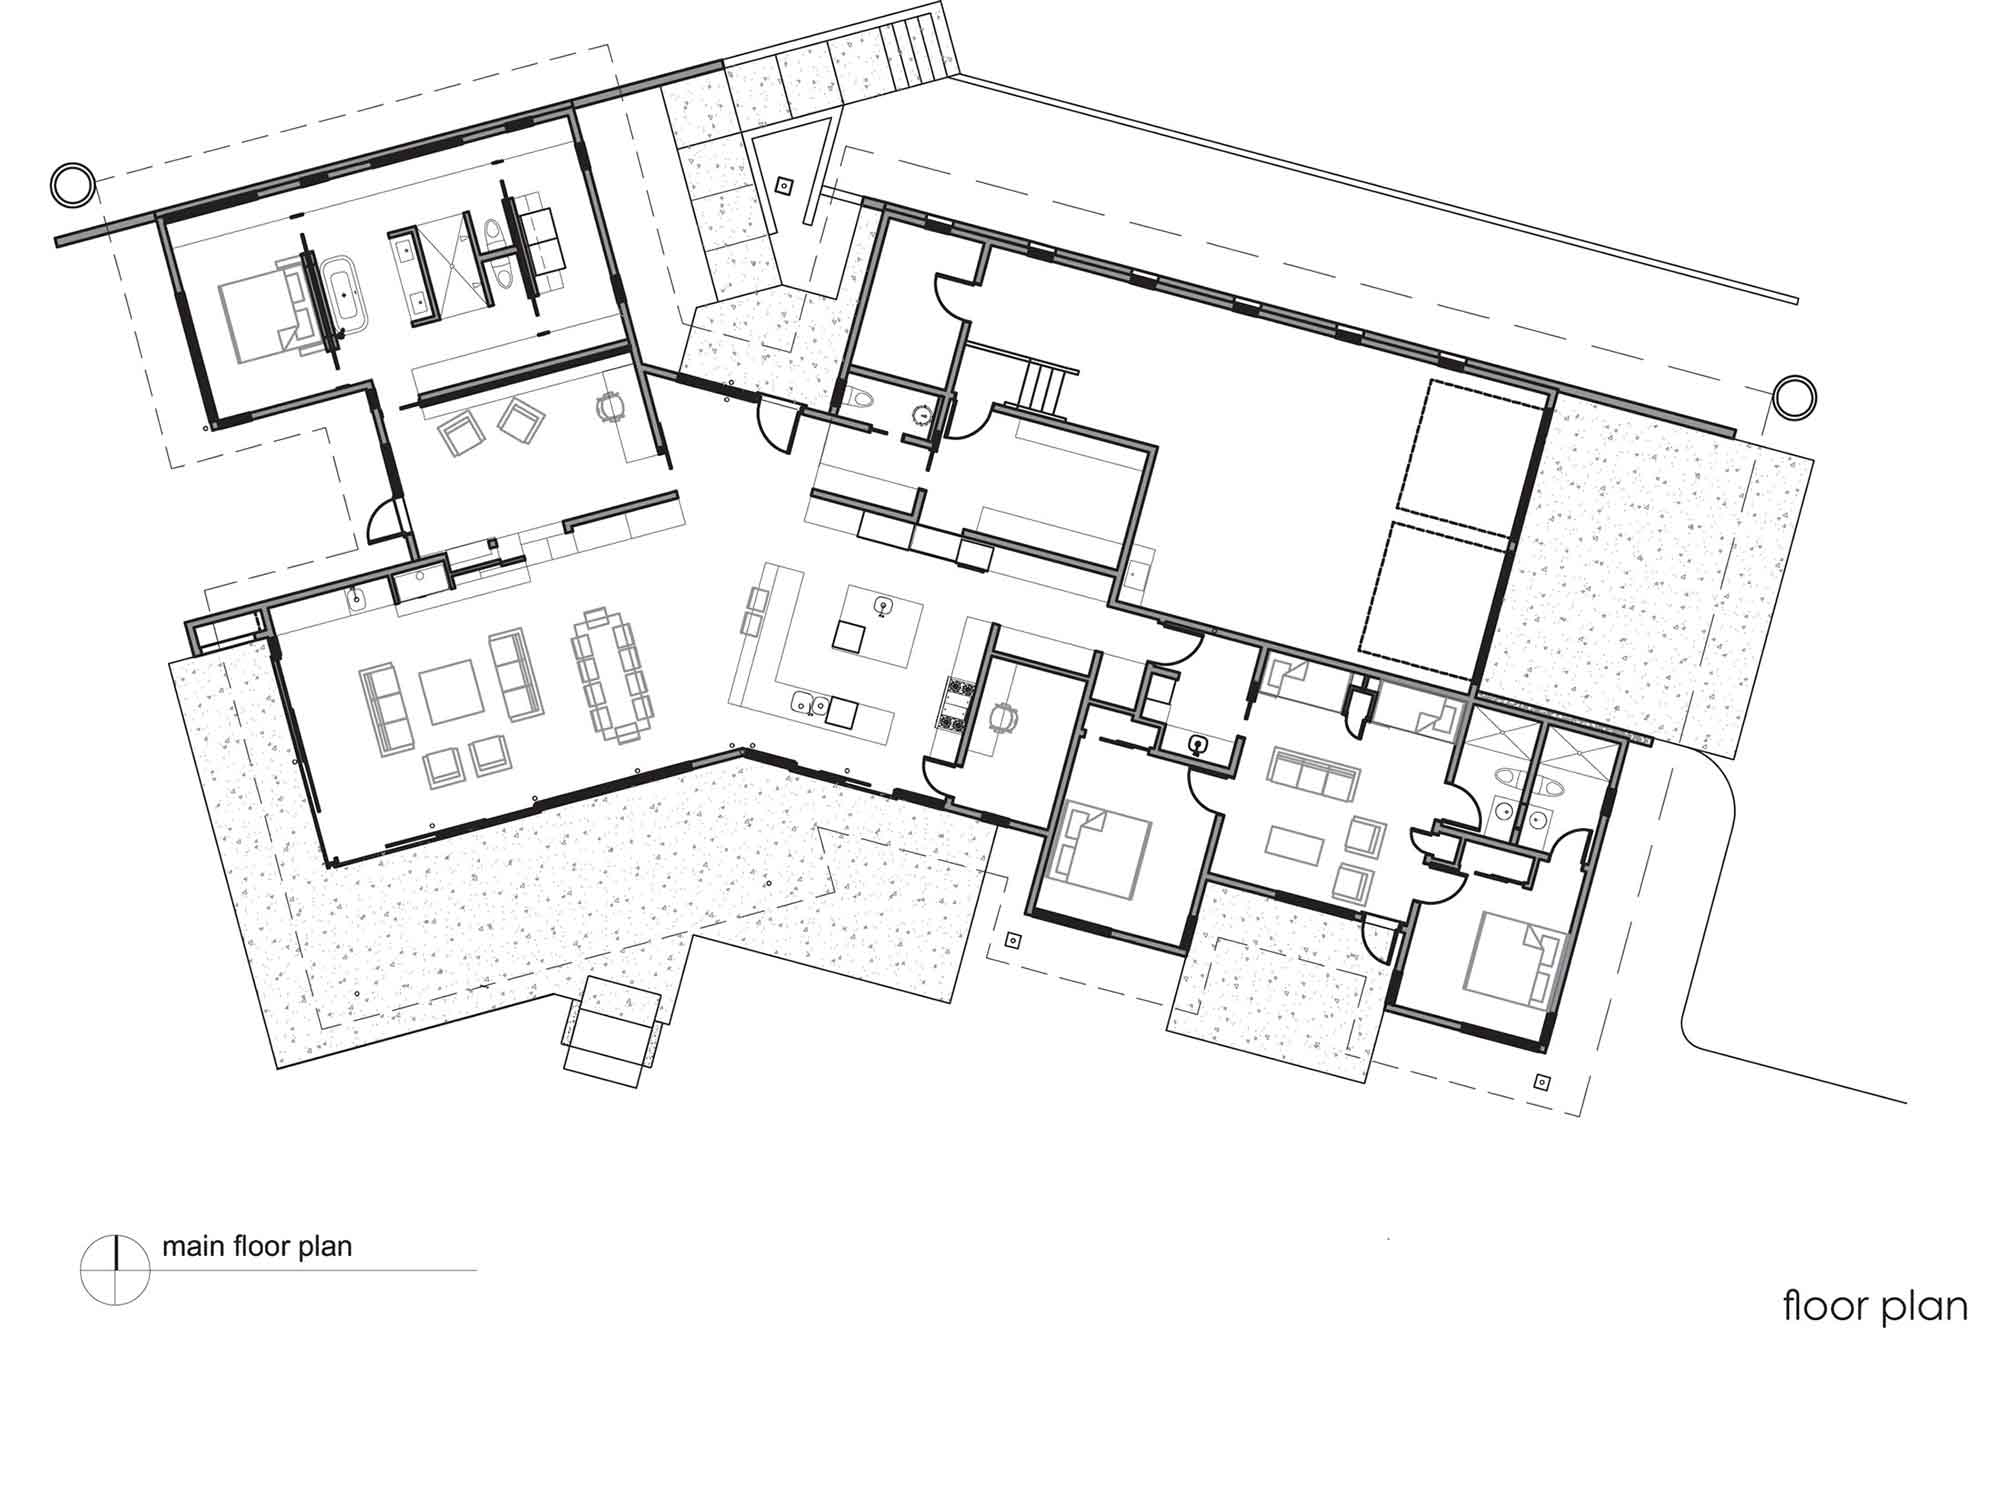 Main Floor Plan, River Bank House, Montana by Balance Associates Architects